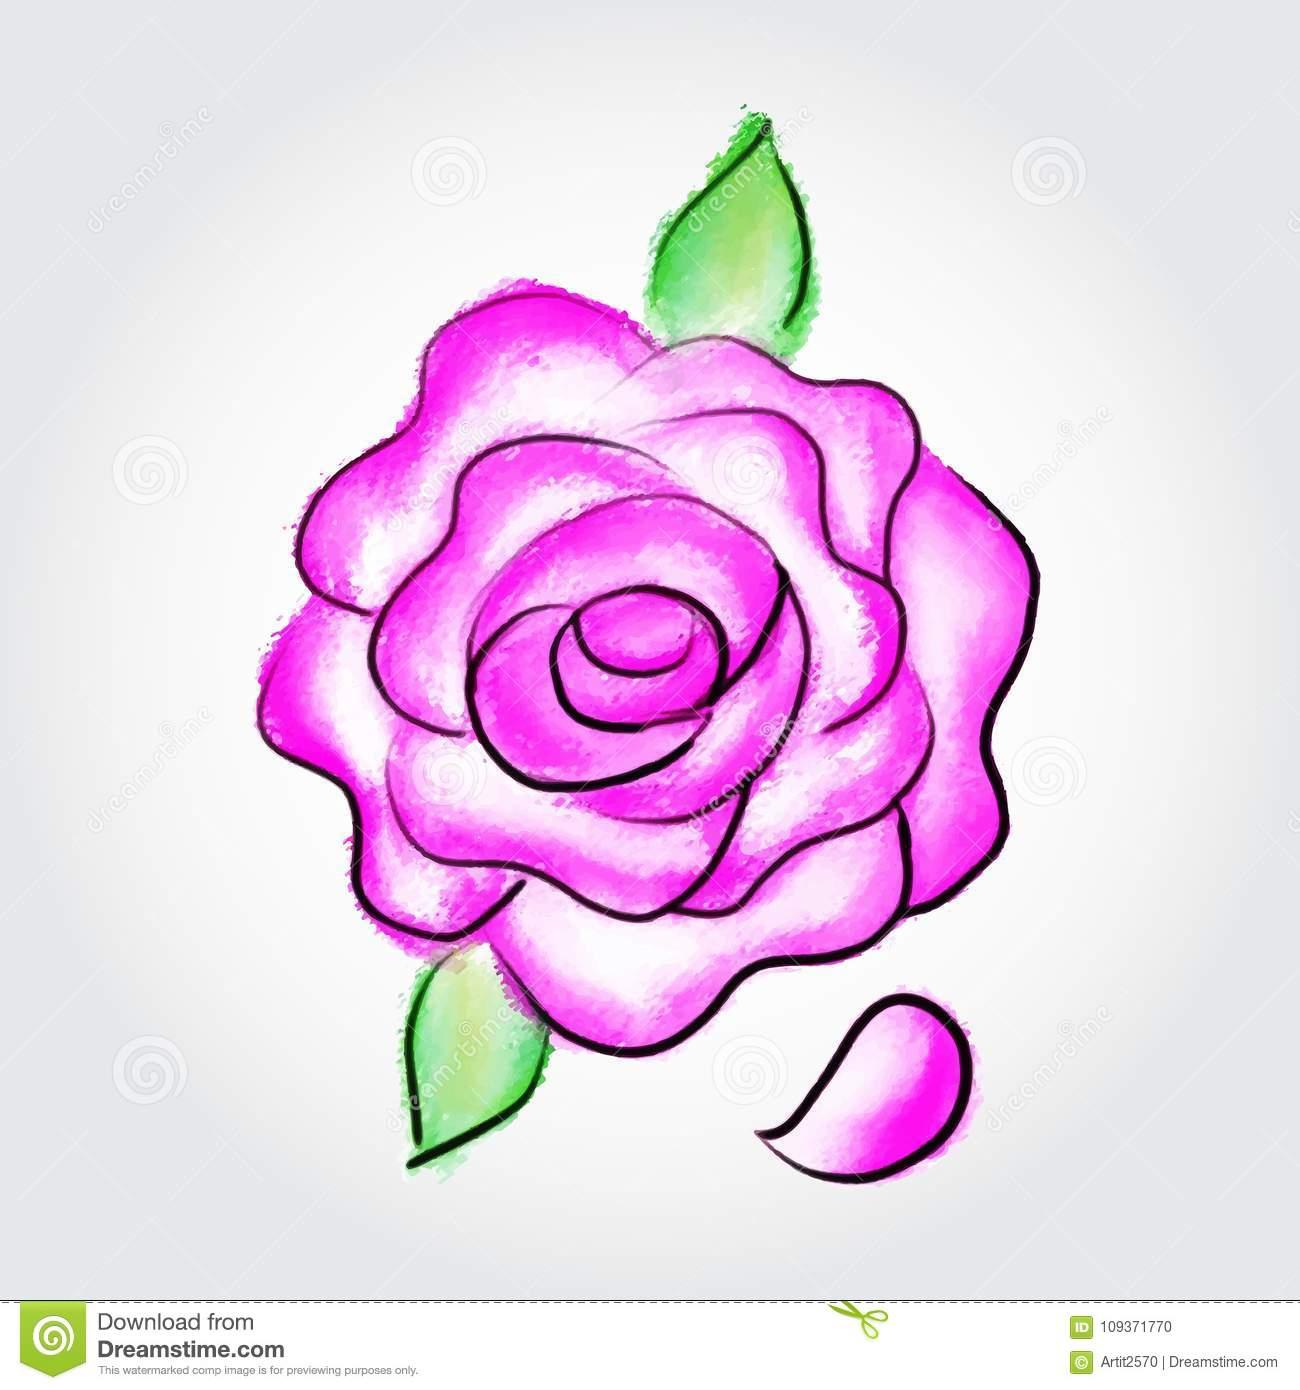 Aquarell-Vektorillustration Des Rosas Rose Gemalte, Hand mit Rosen Bilder Gemalt